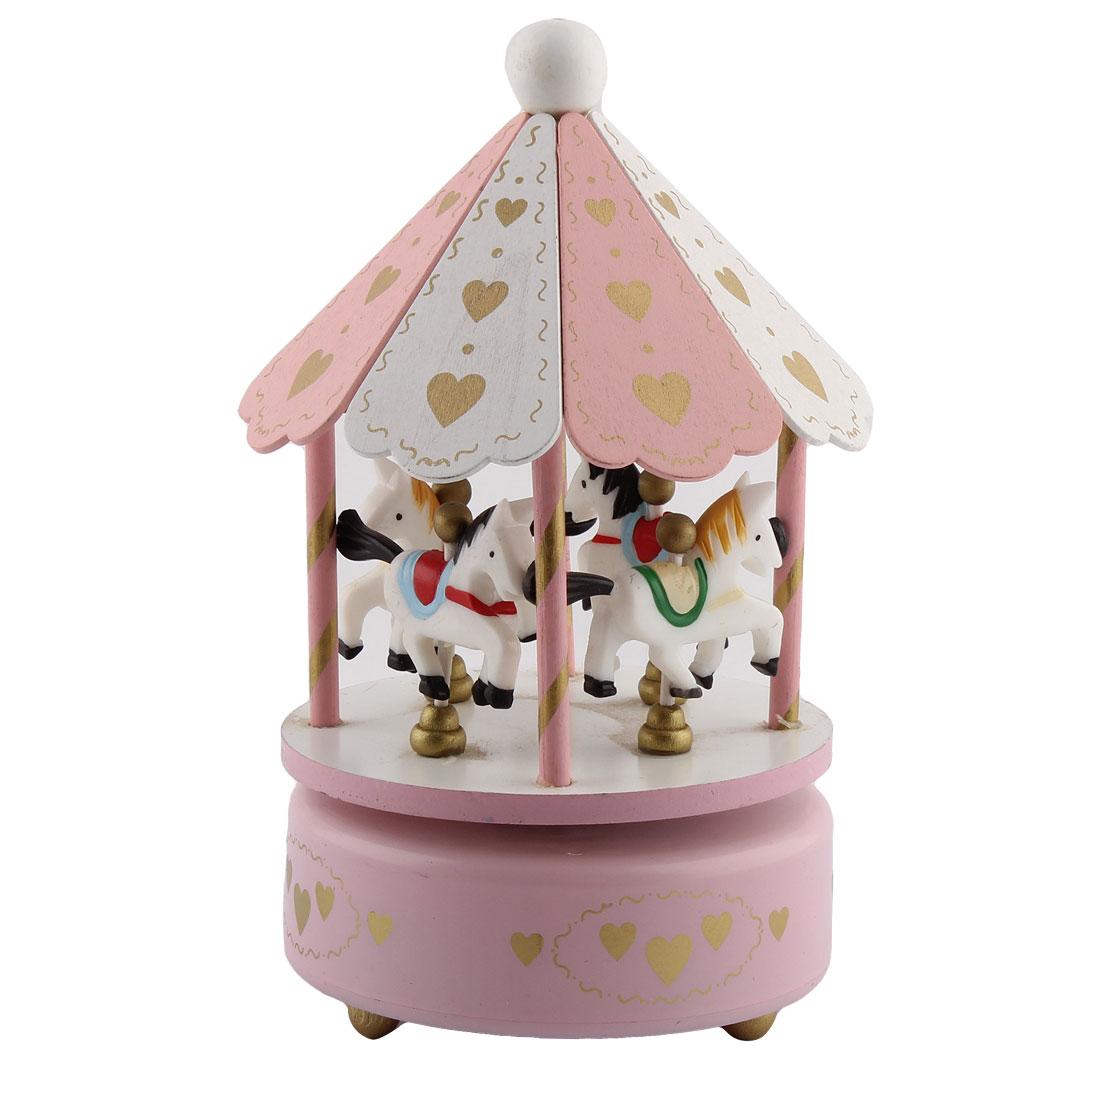 Metal Base Love Pattern 4 Horses Merry-Go-Round Carousel Music Box Pink